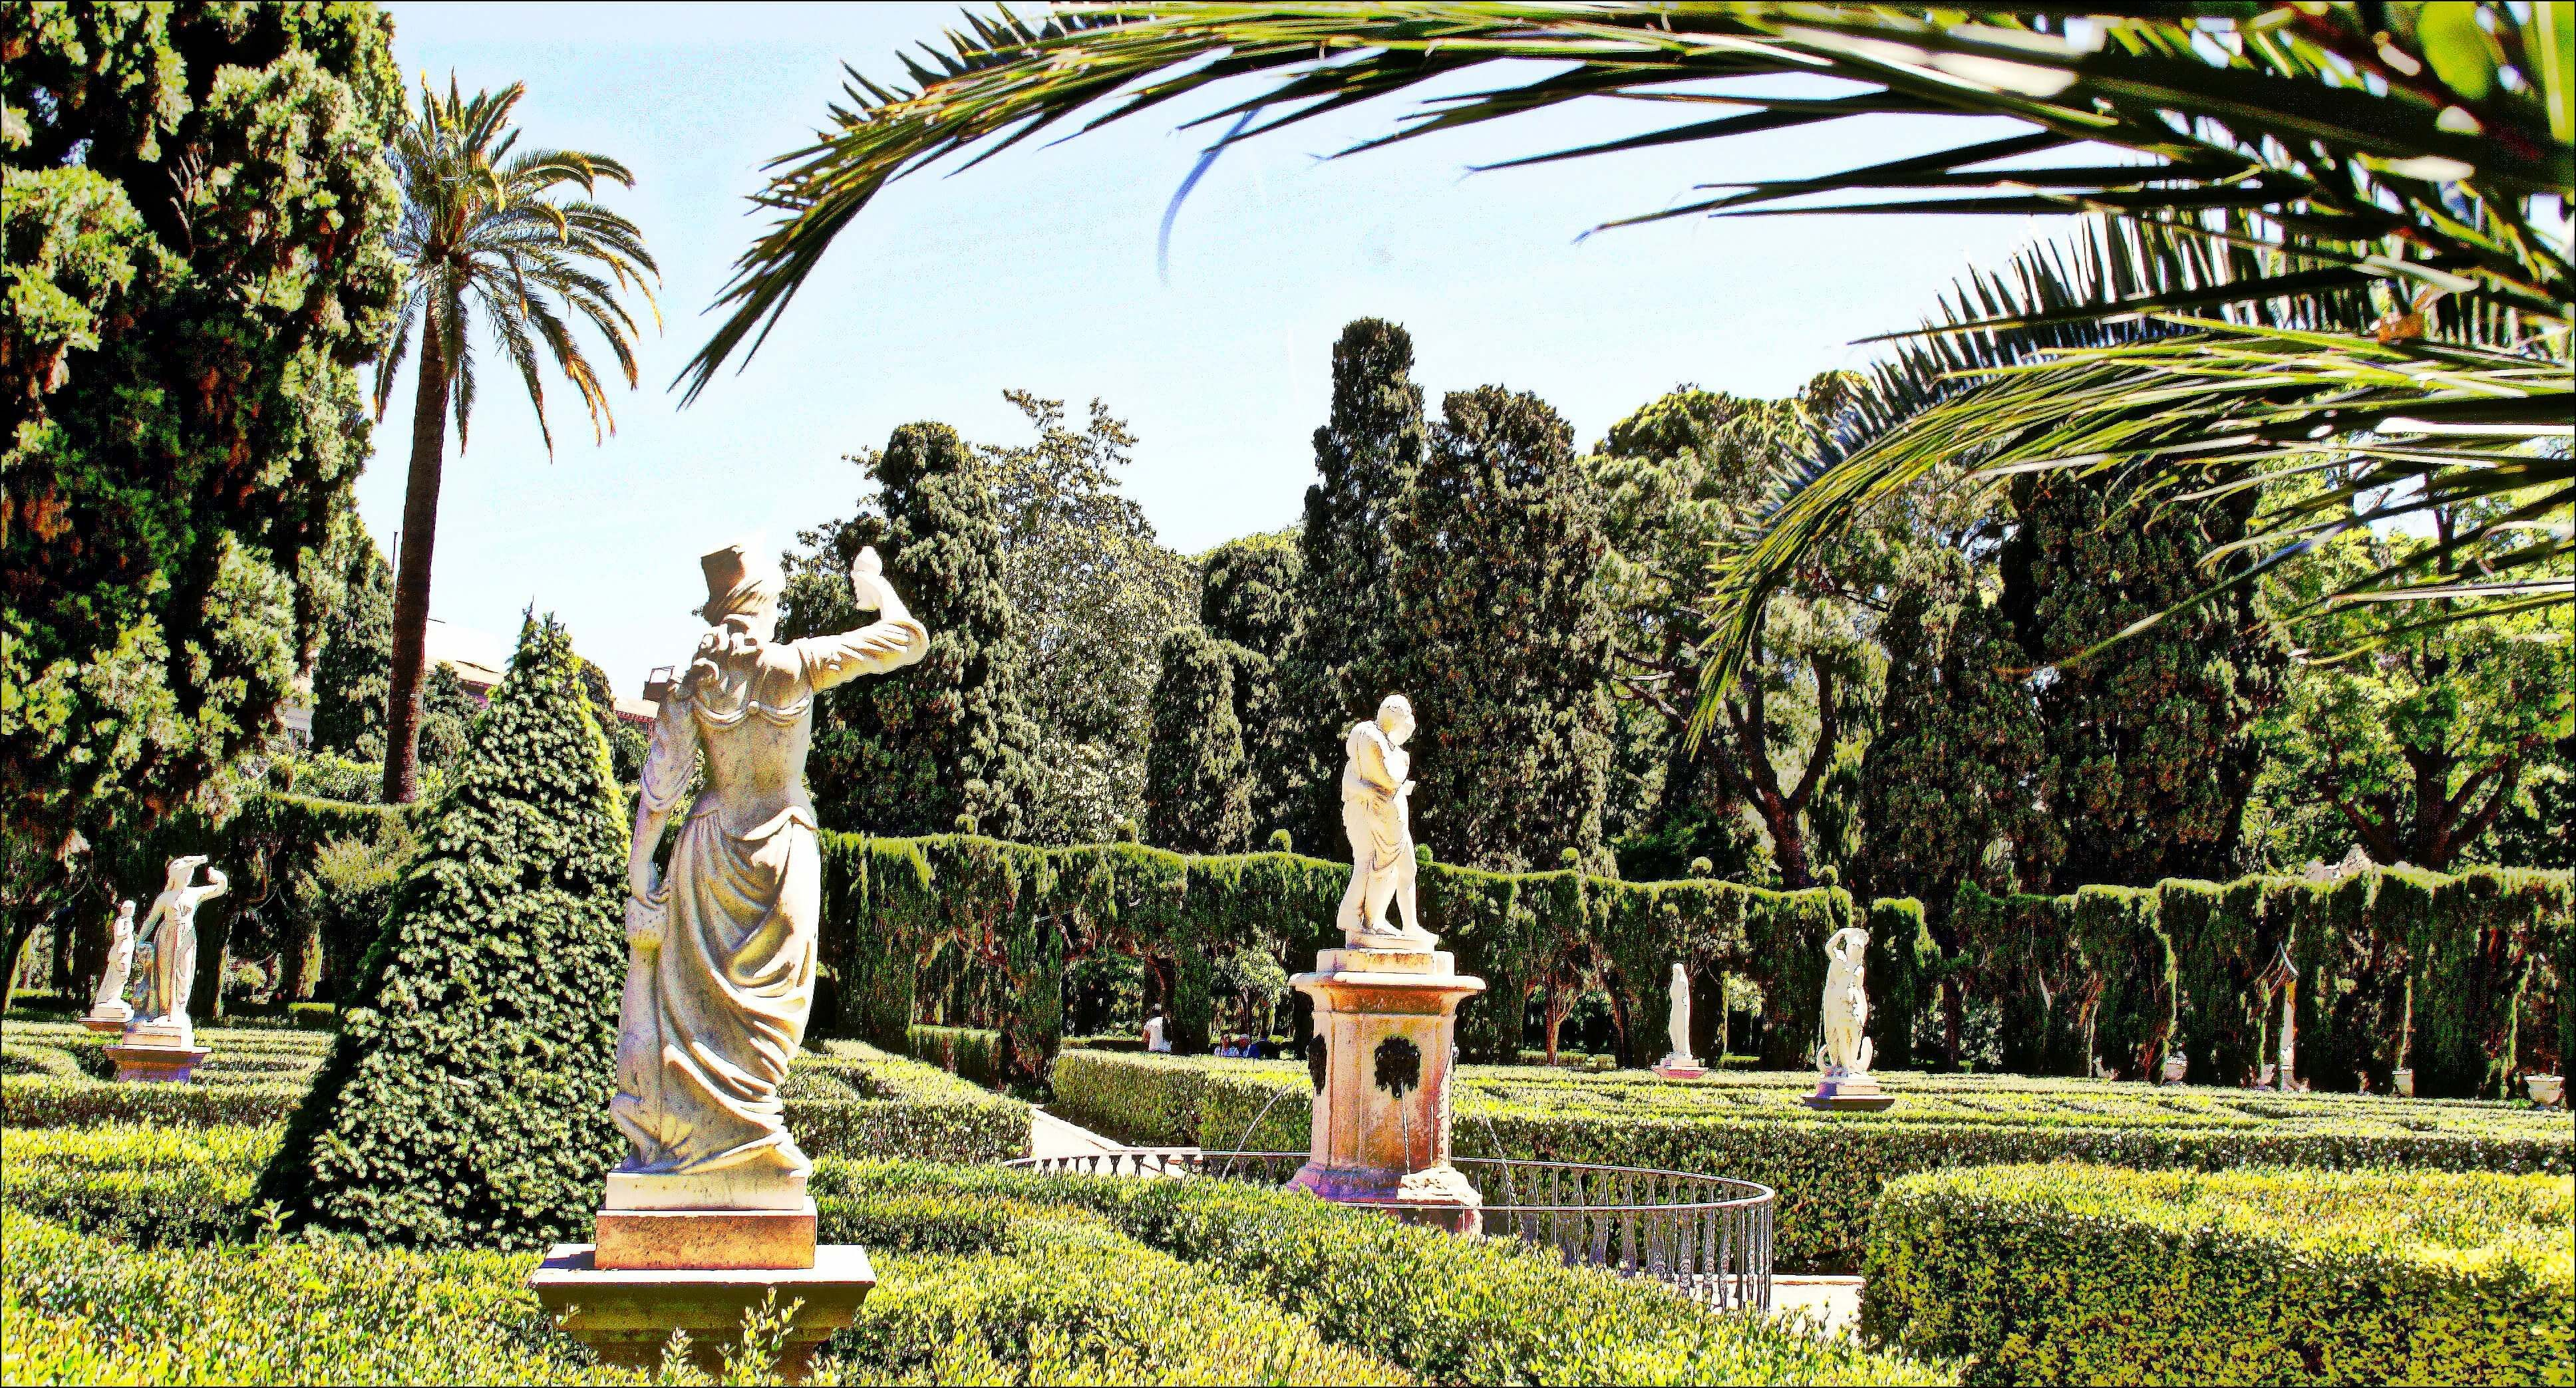 Jardines de monforte valencia espa a pinterest for Jardines de monforte valencia